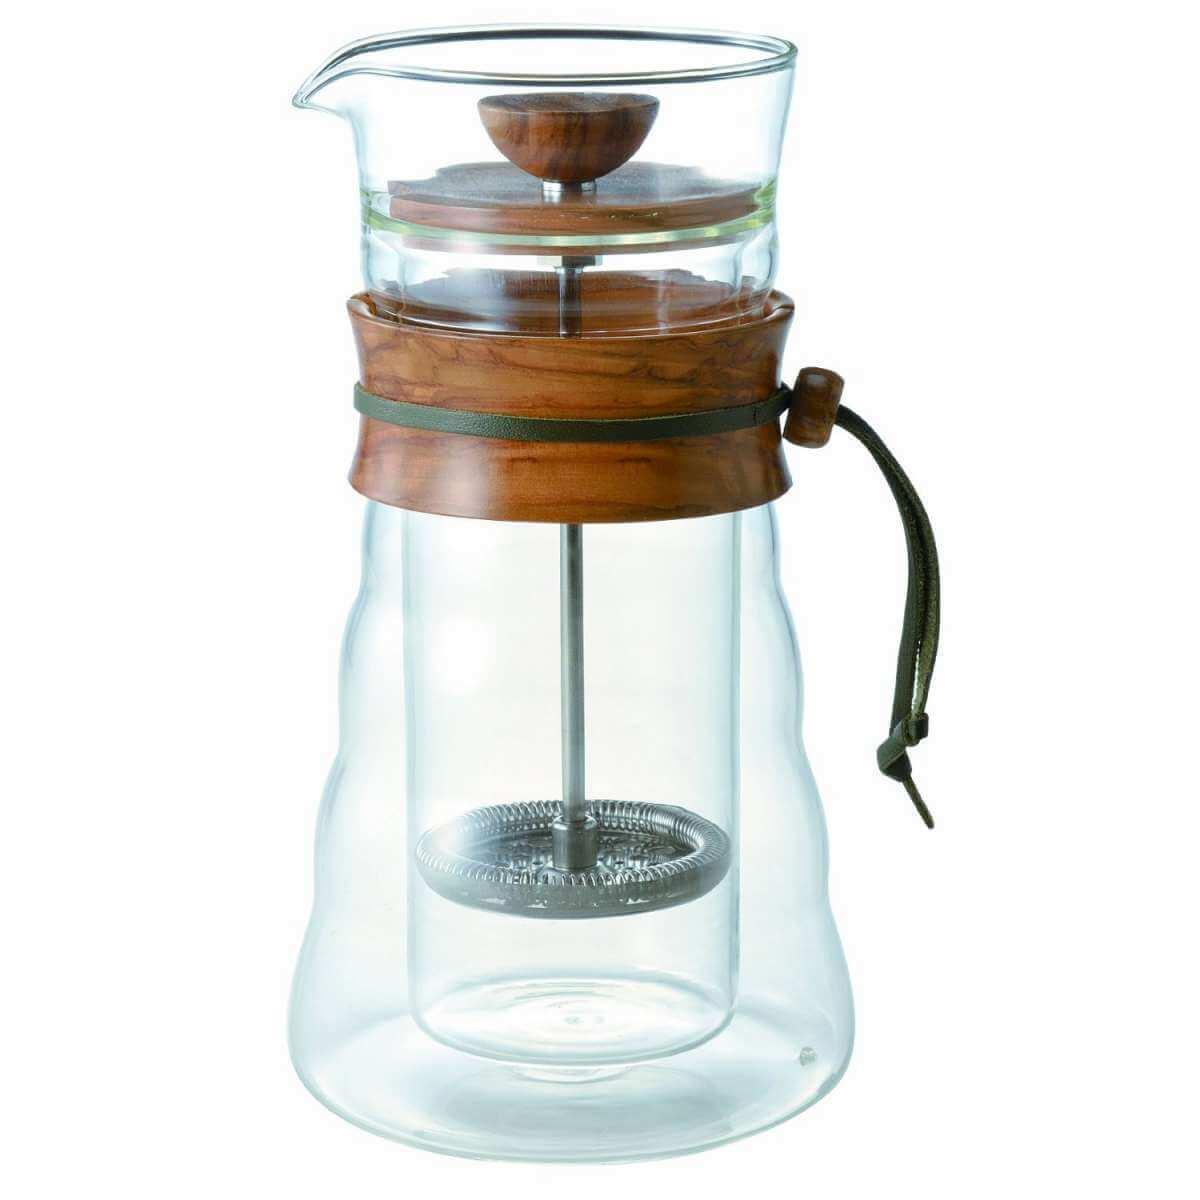 cafeti re piston filtre siphon dripper aeropress caf s pfaff. Black Bedroom Furniture Sets. Home Design Ideas